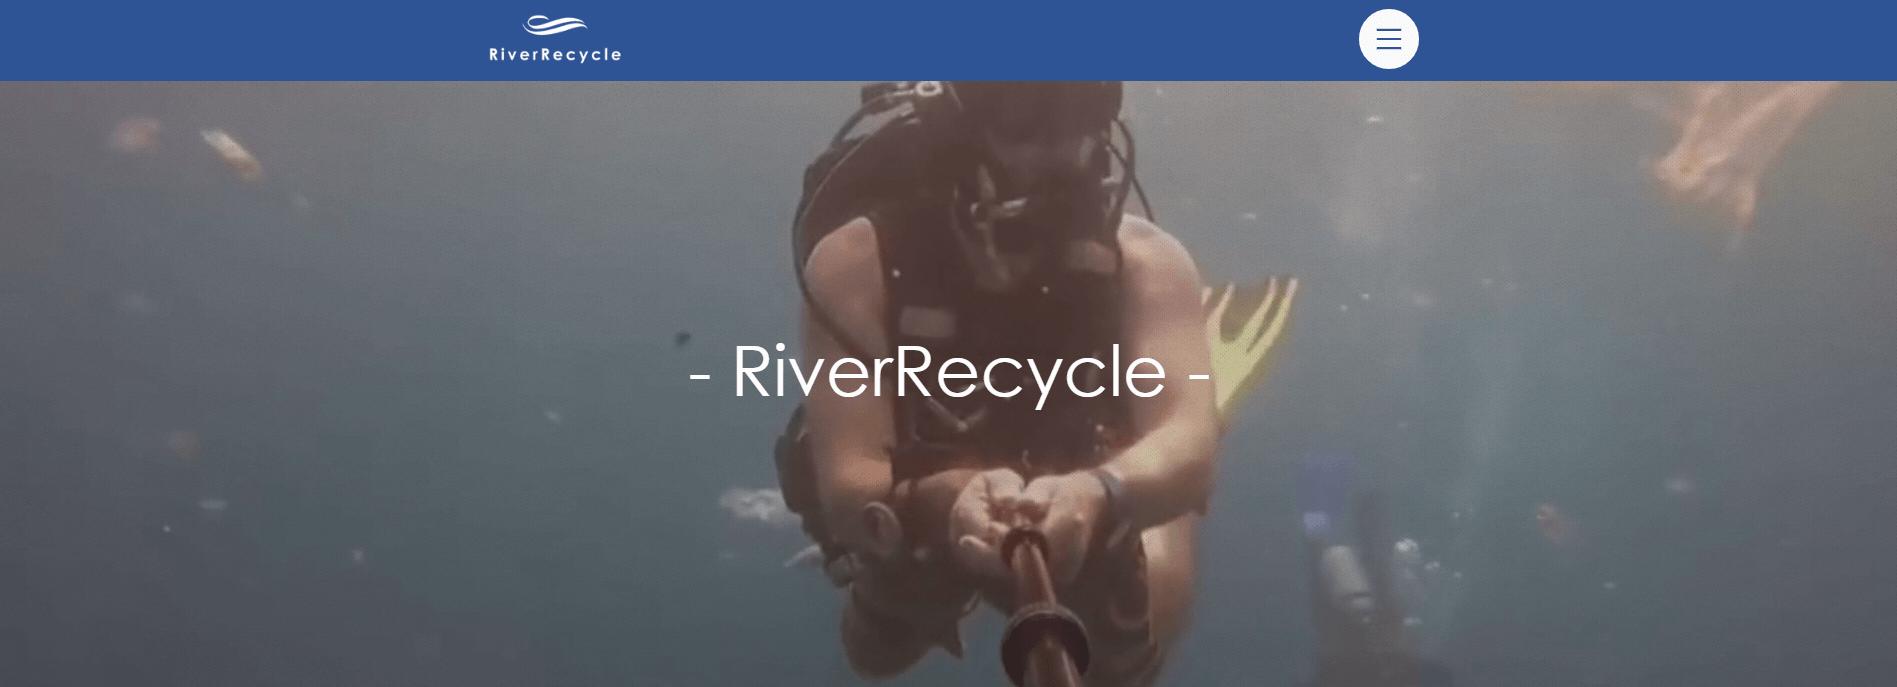 RiverRecycle.com